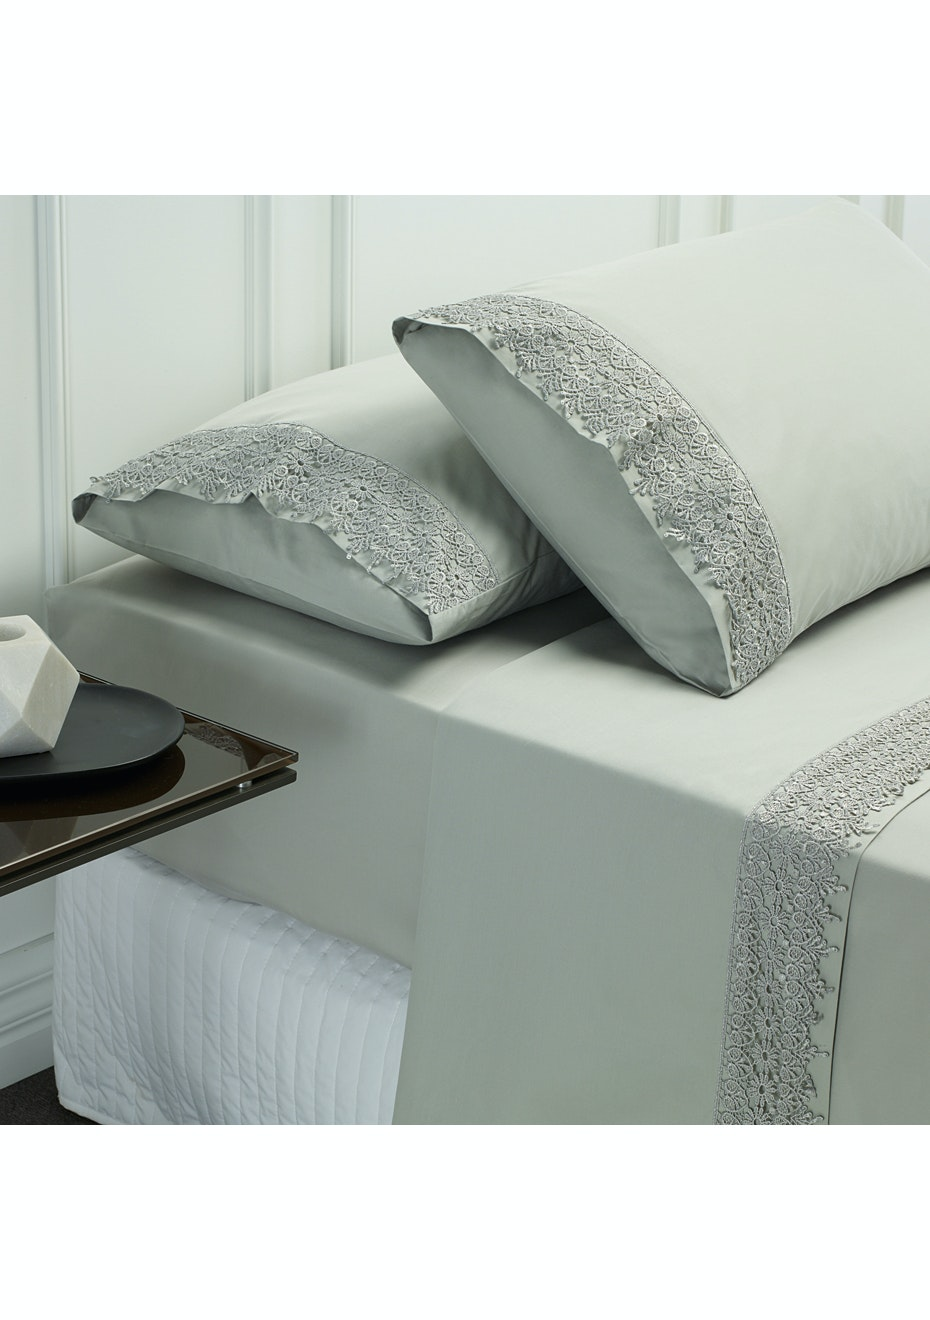 Style & Co 1000 Thread count Egyptian Cotton Hotel Collection Valencia Sheet sets Queen Silver